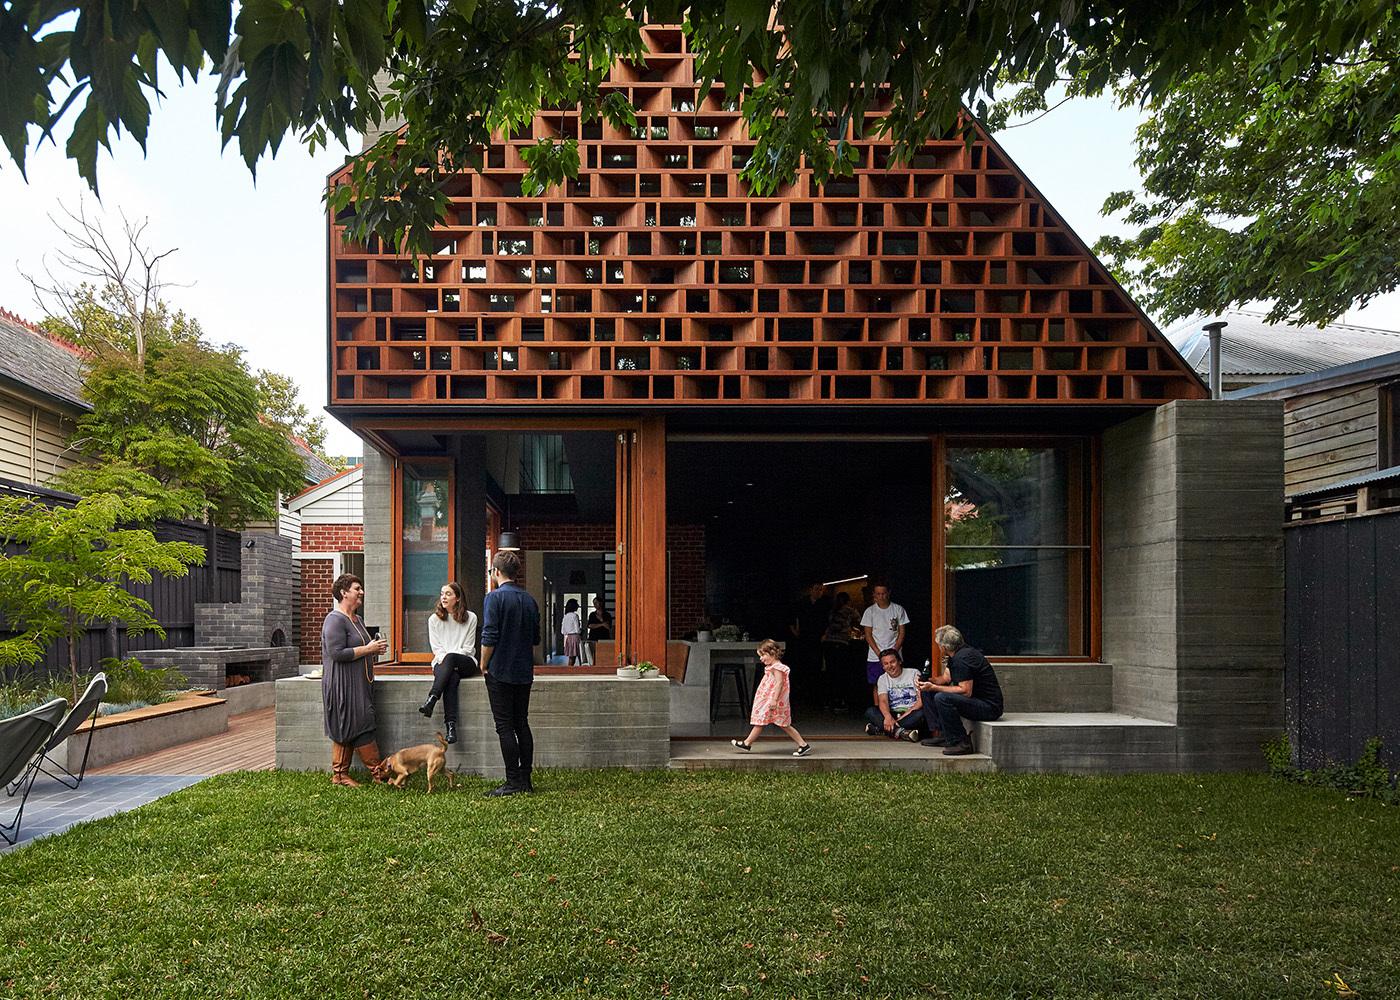 Local House / MAKE architecture (22)